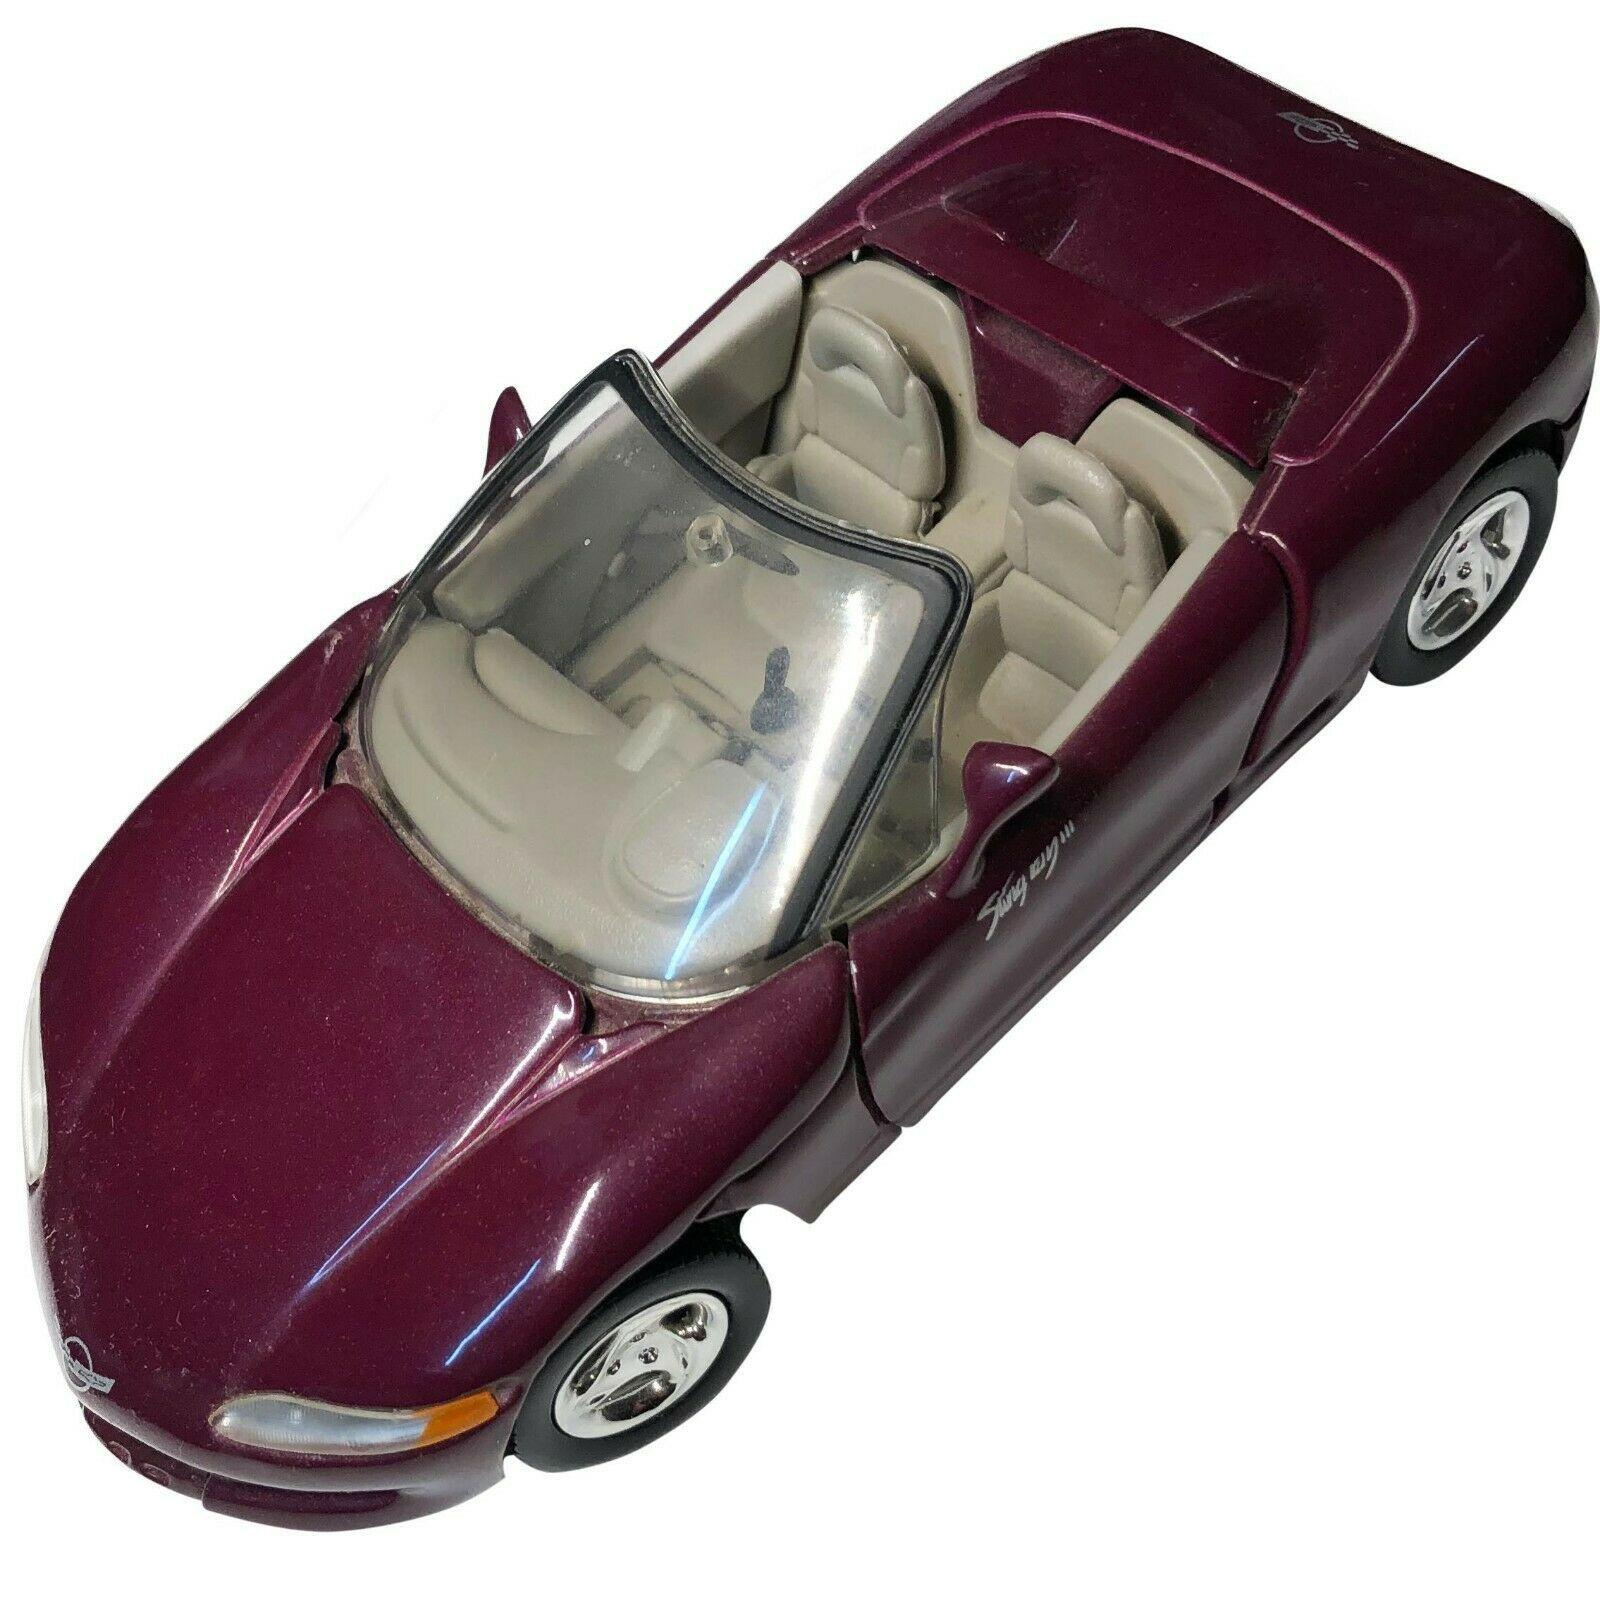 "Chevy Corvette Stingray III Die-cast Car 1:24 Motormax 8"" No. 68019 #452 - $19.99"